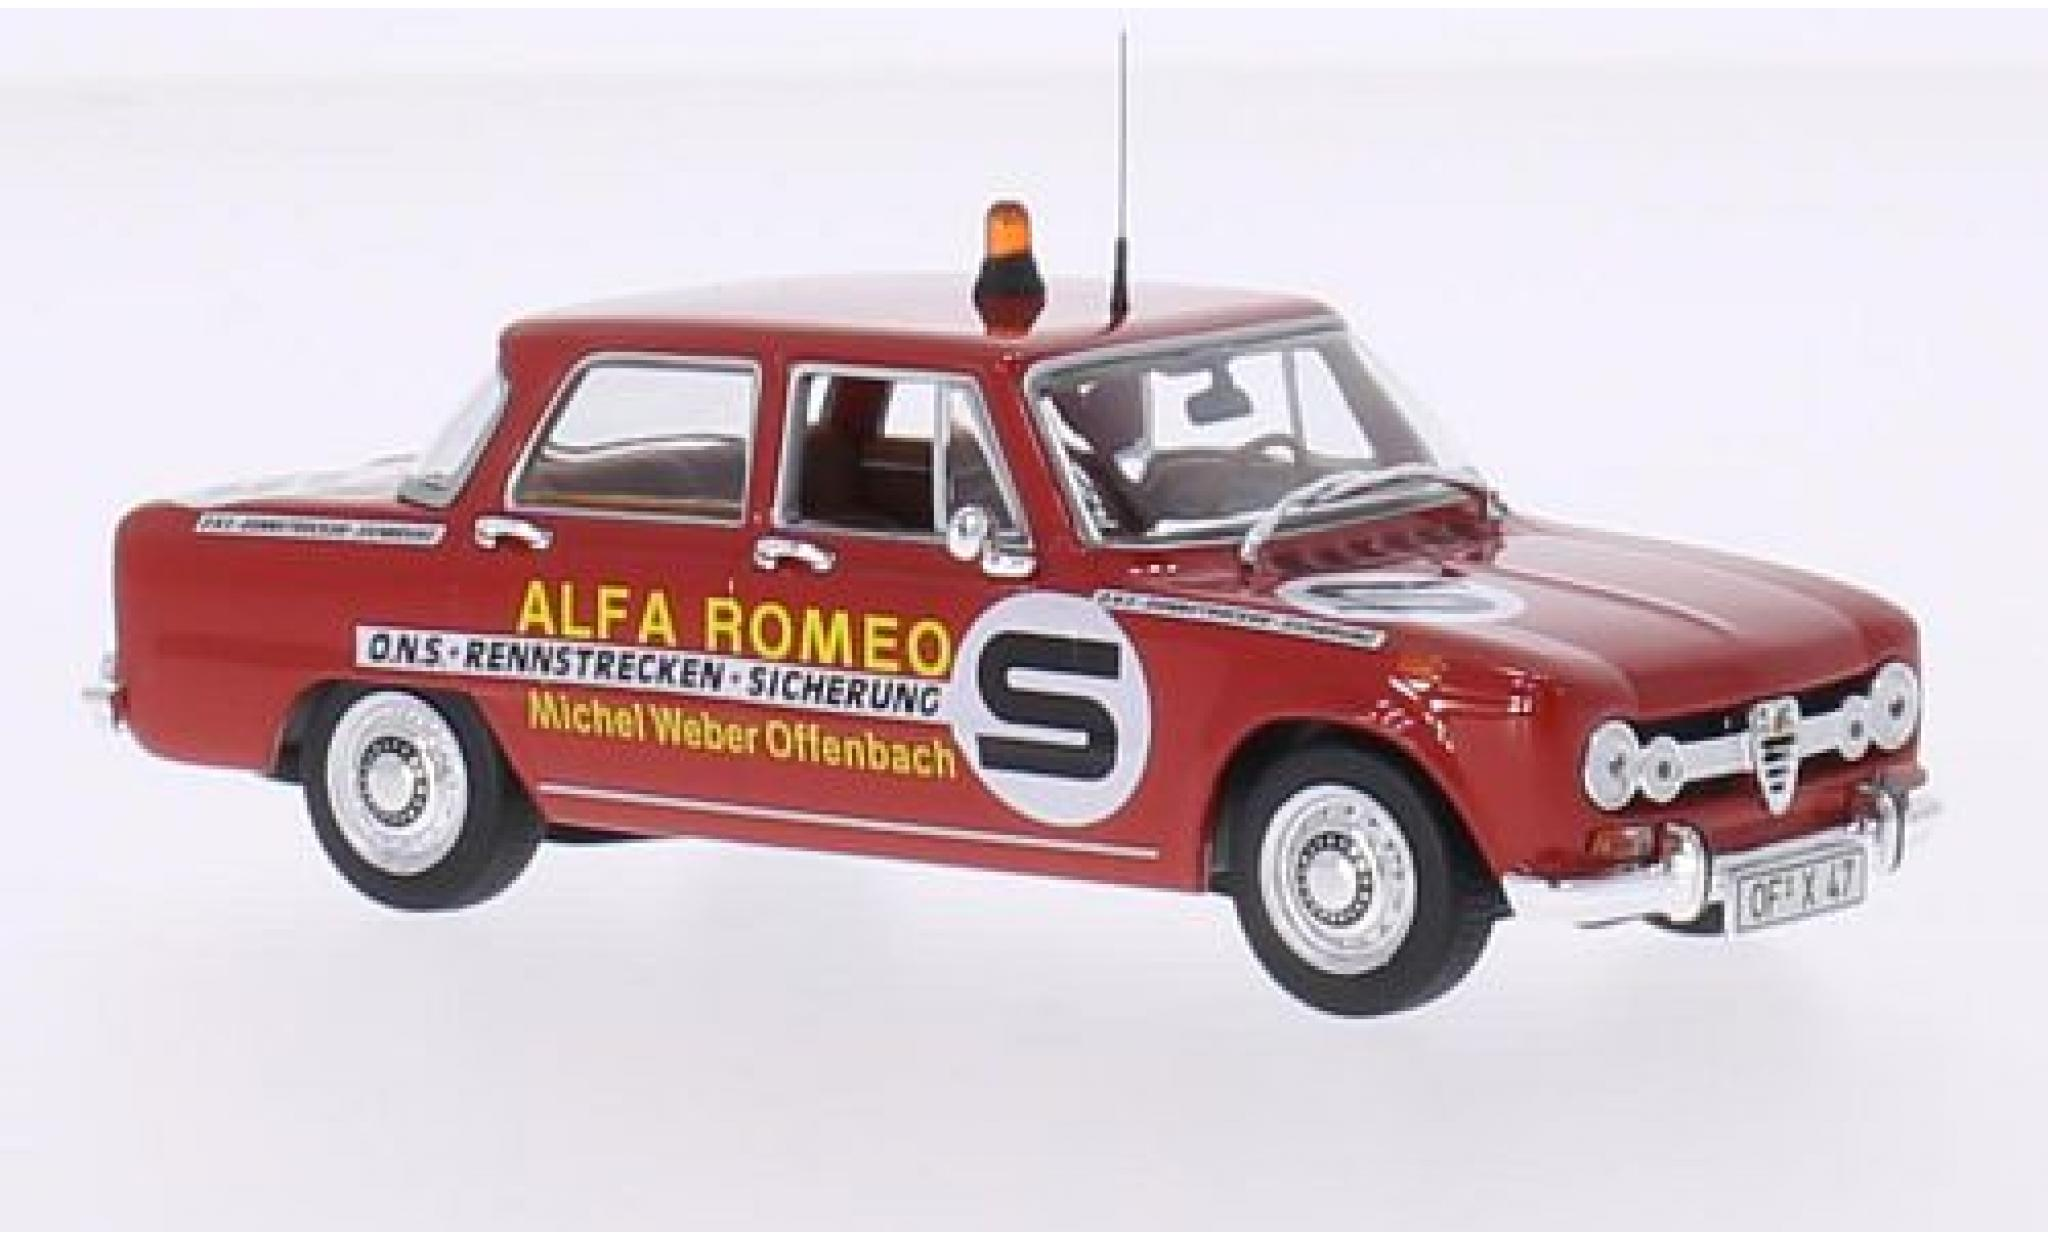 Alfa Romeo Giulia 1/43 Minichamps ONS Rennstrecken-Sicherung 1973